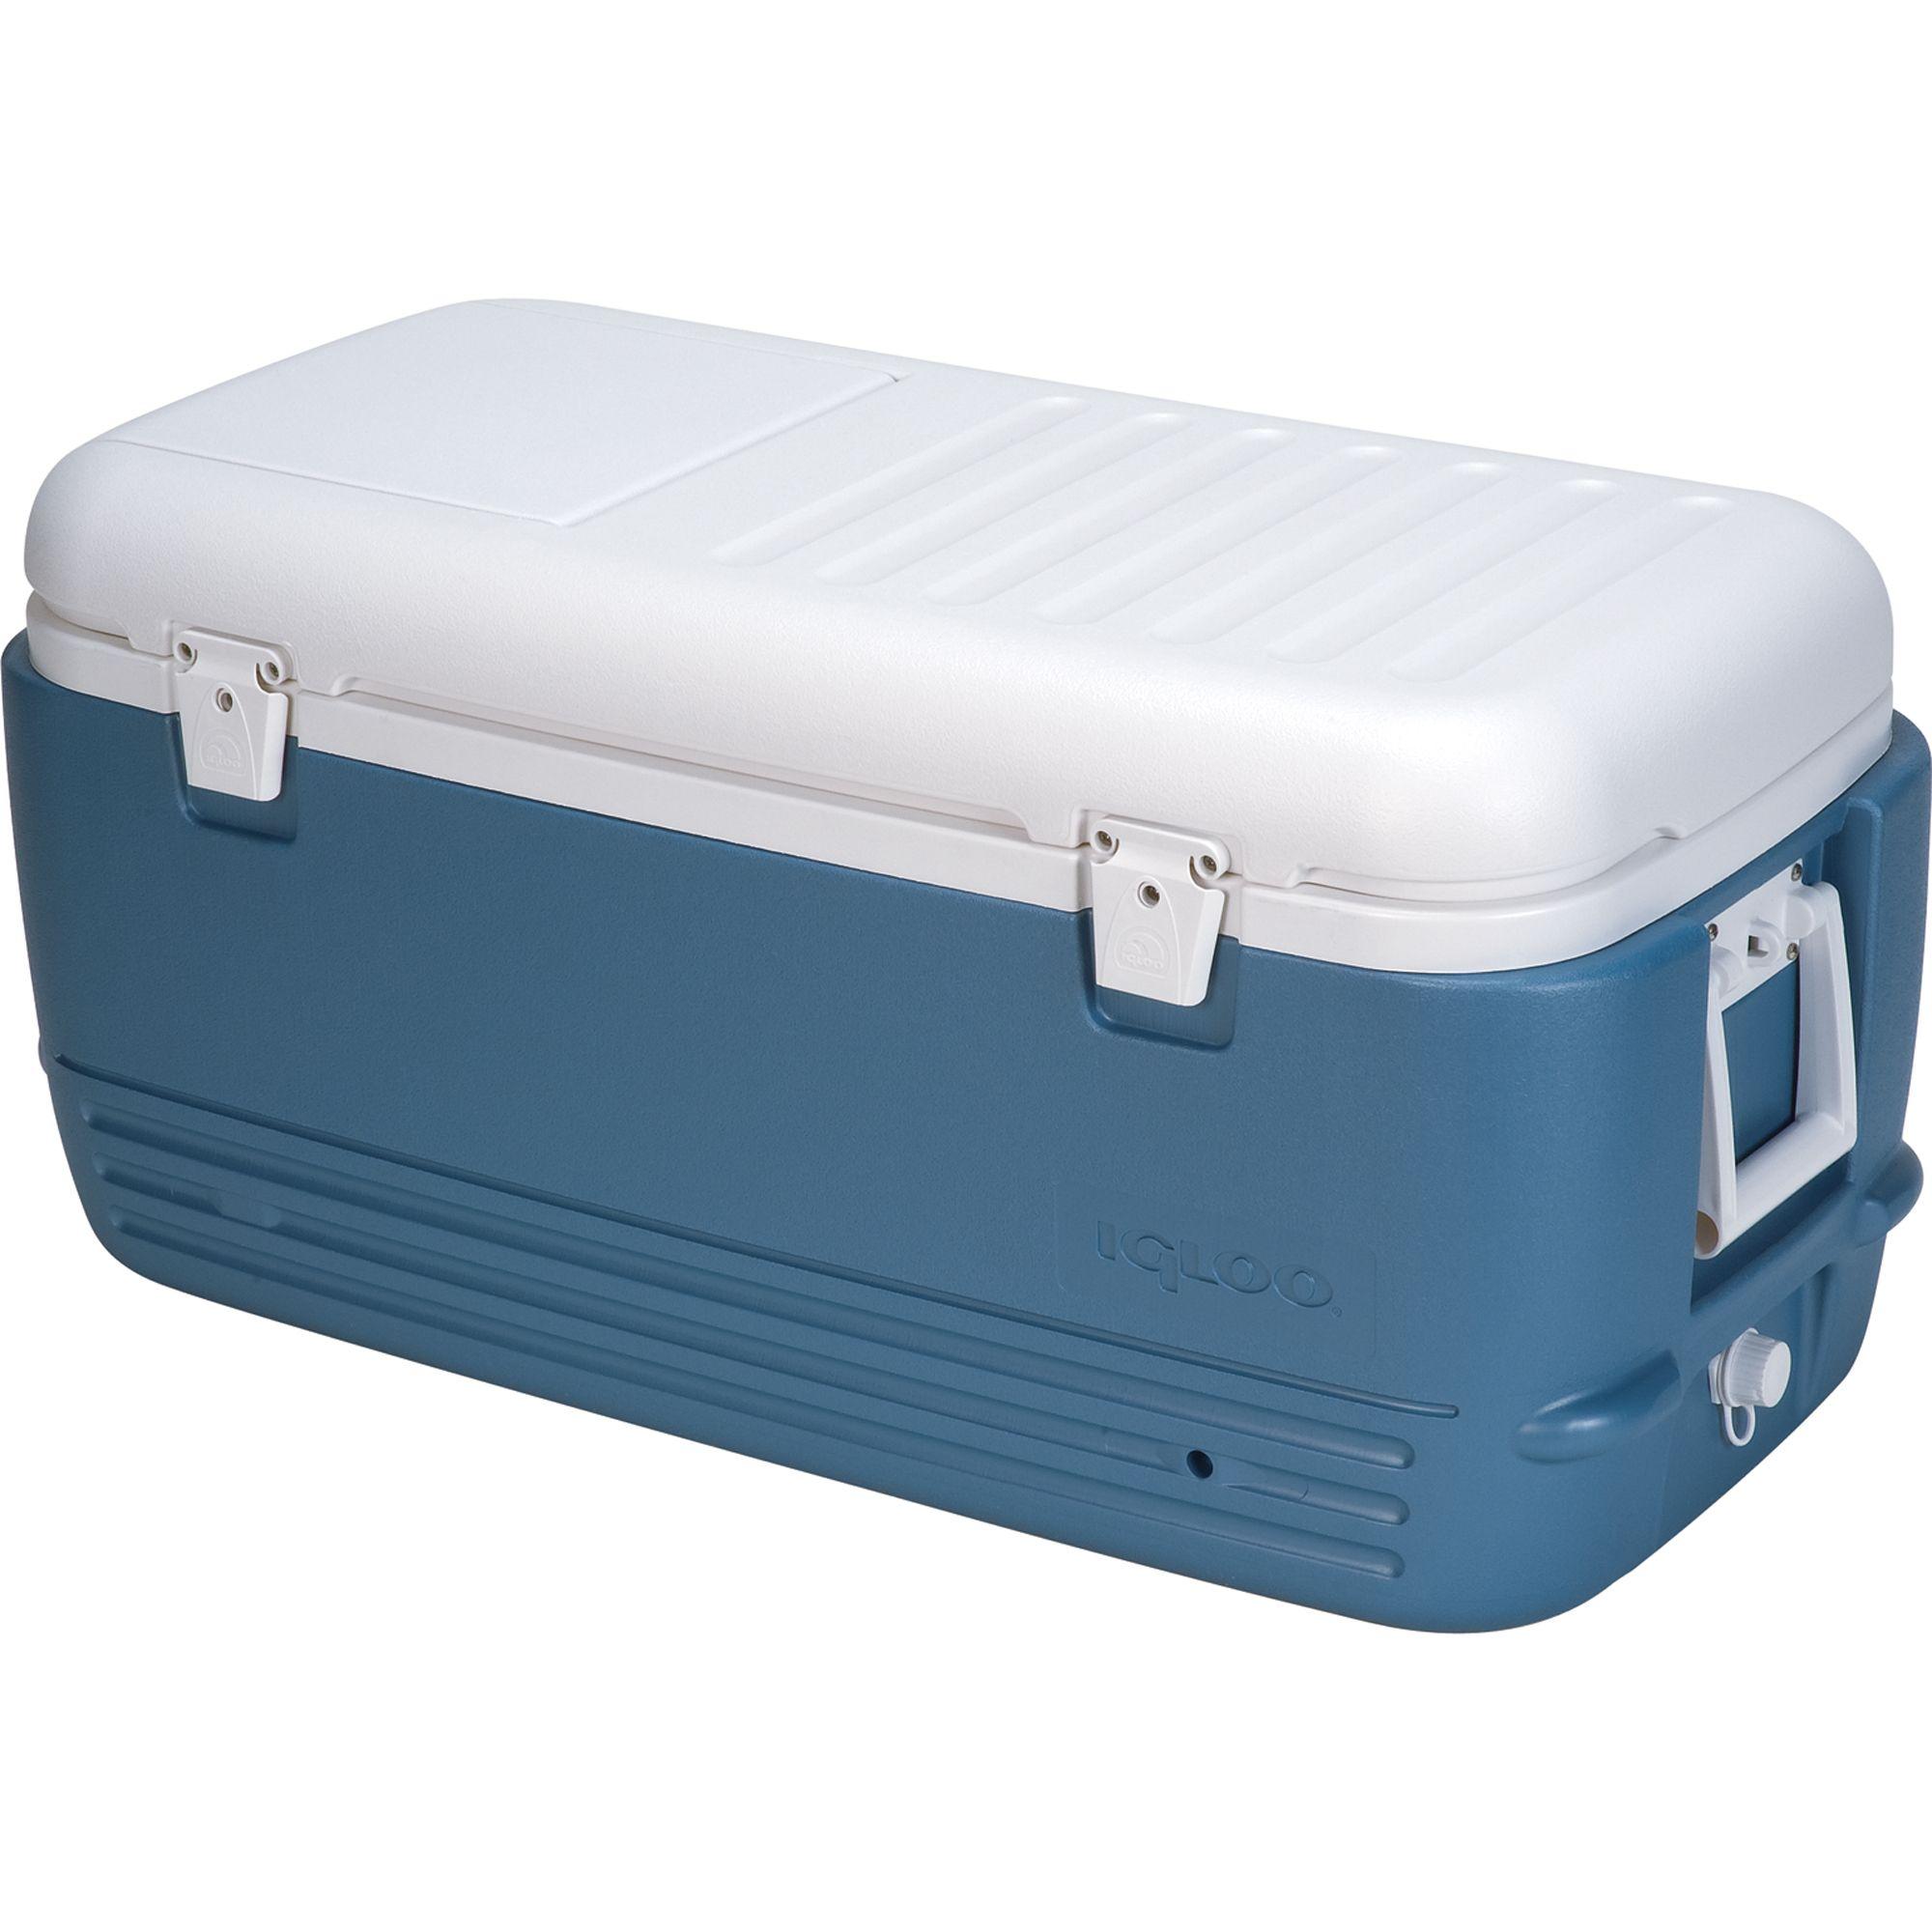 Igloo 100 Quart Maxcold Cooler Large-capacity Portables